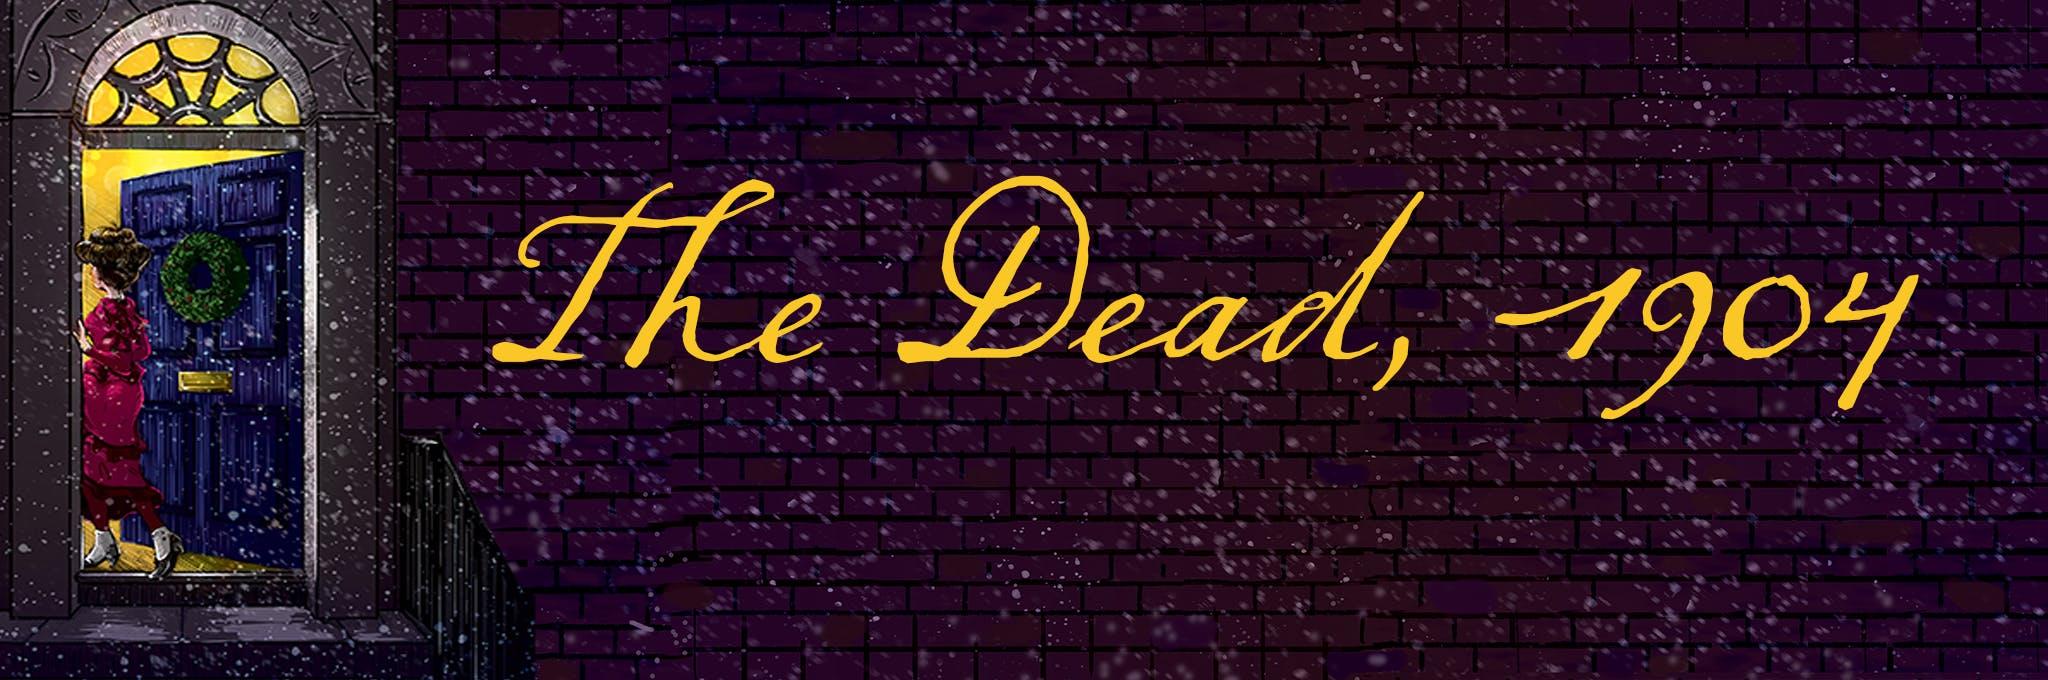 The Dead, 1904 Logo